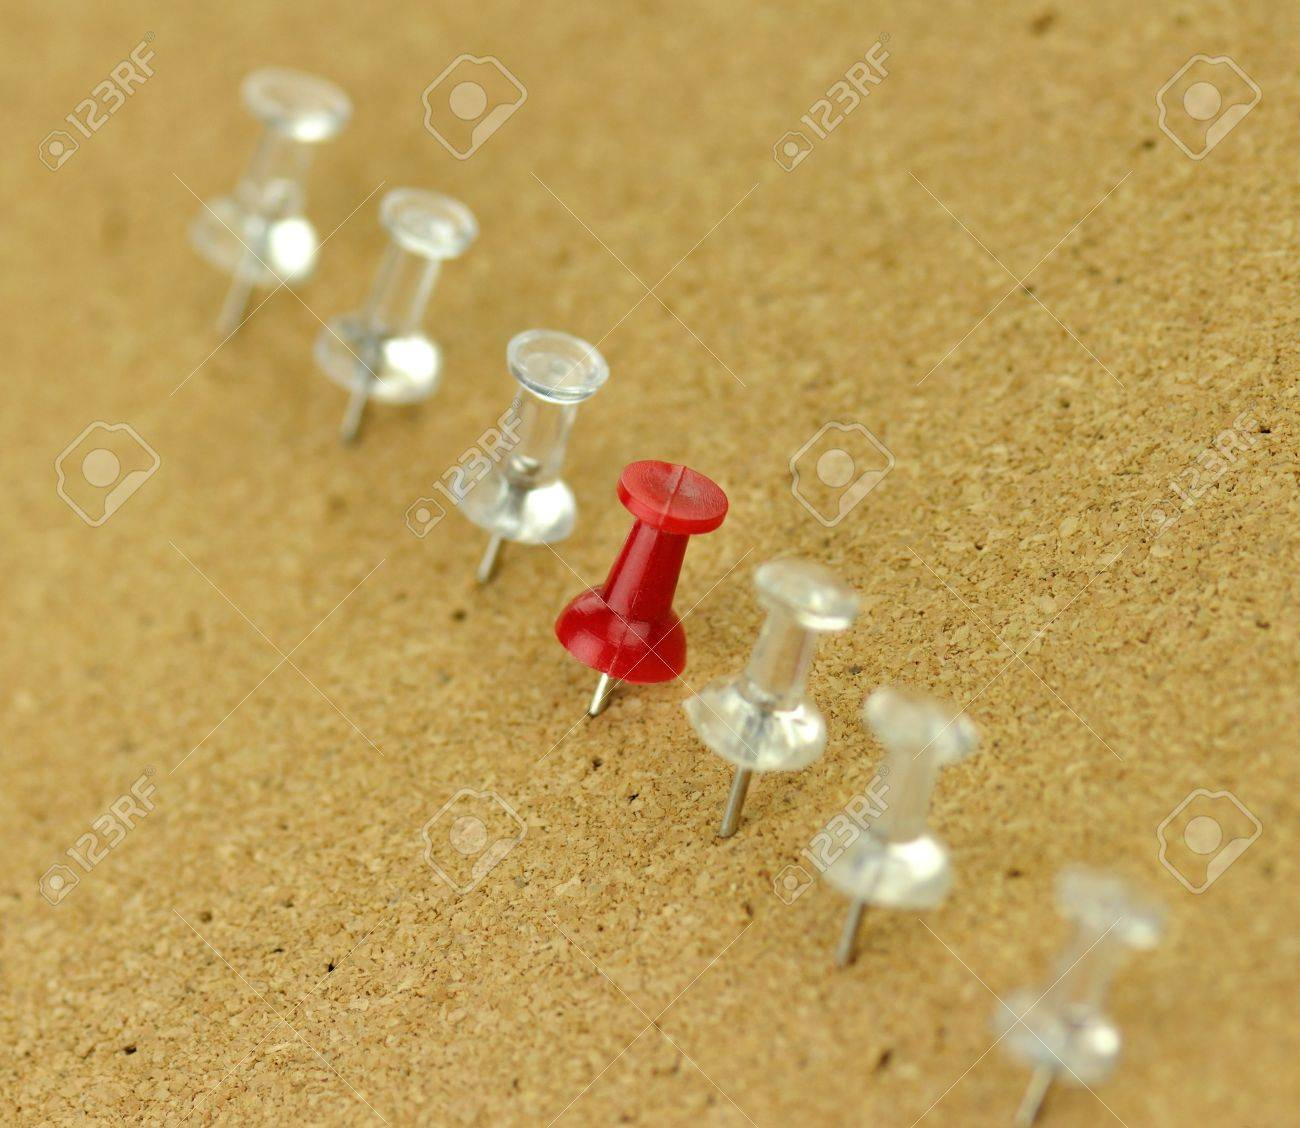 plastic thumbtack on cork board Stock Photo - 8896429